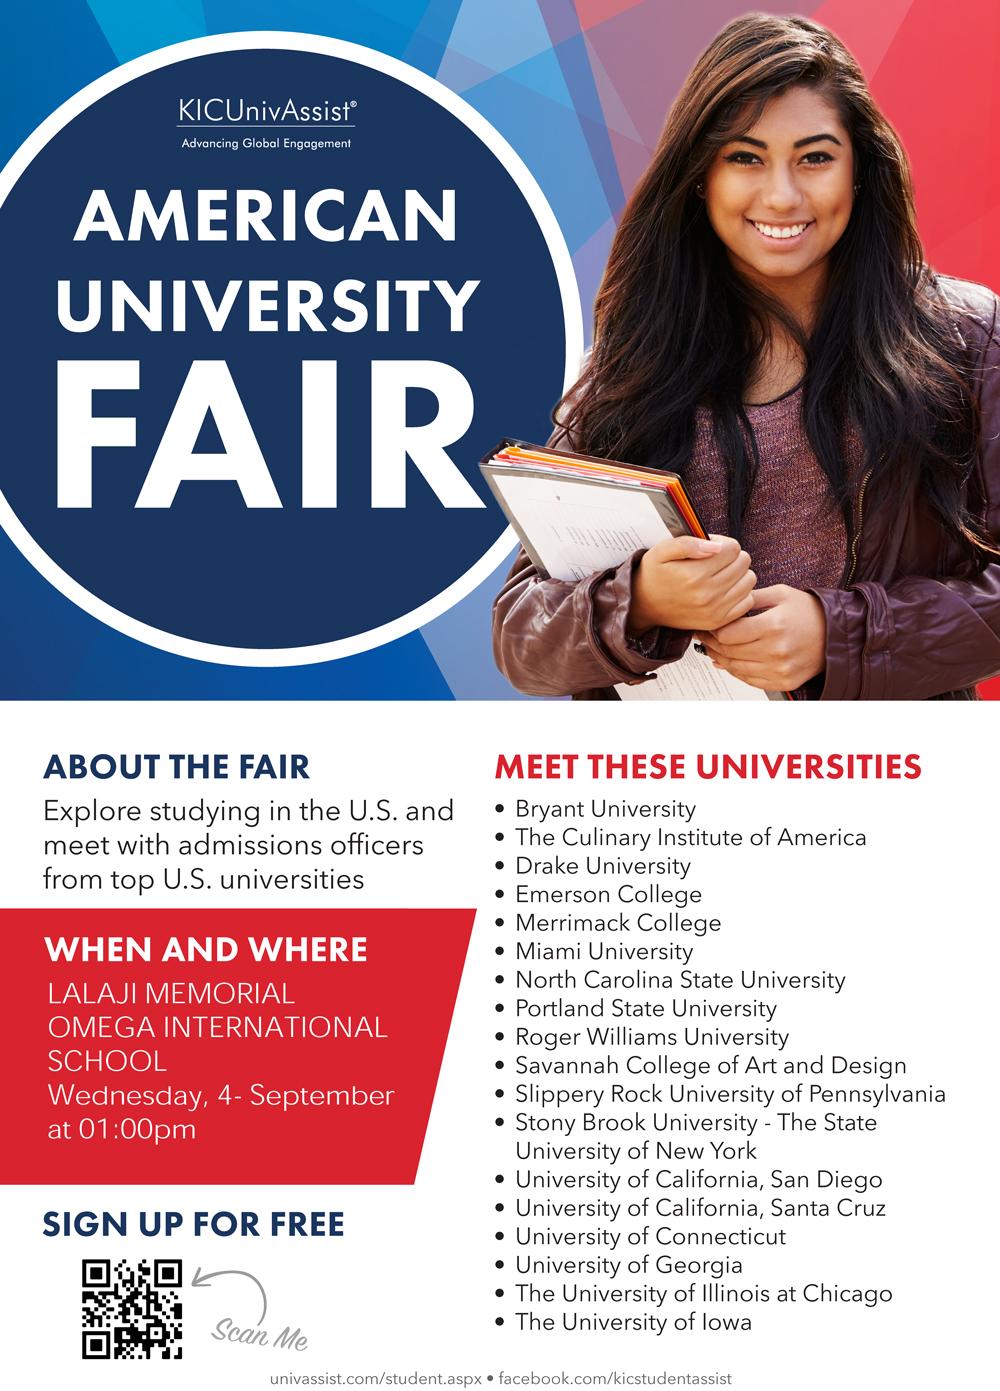 American University Fair